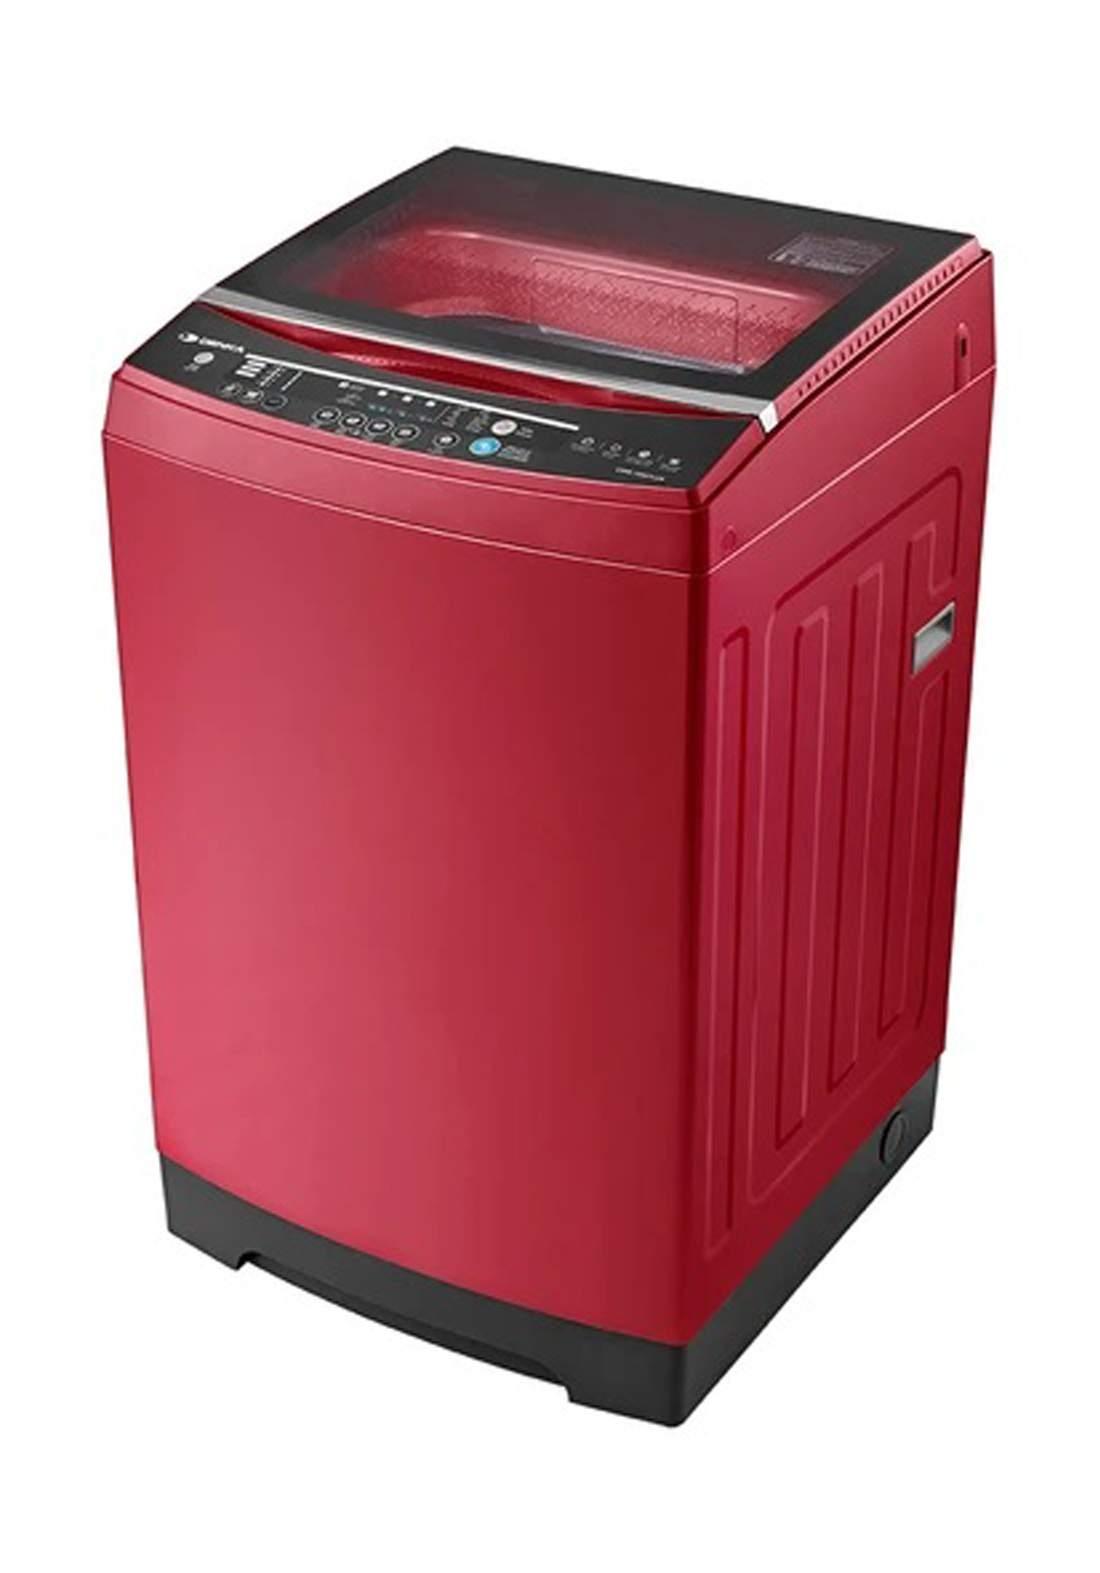 DENKA QWM-1950TLDR washing machine 19kg  غسالة ملابس